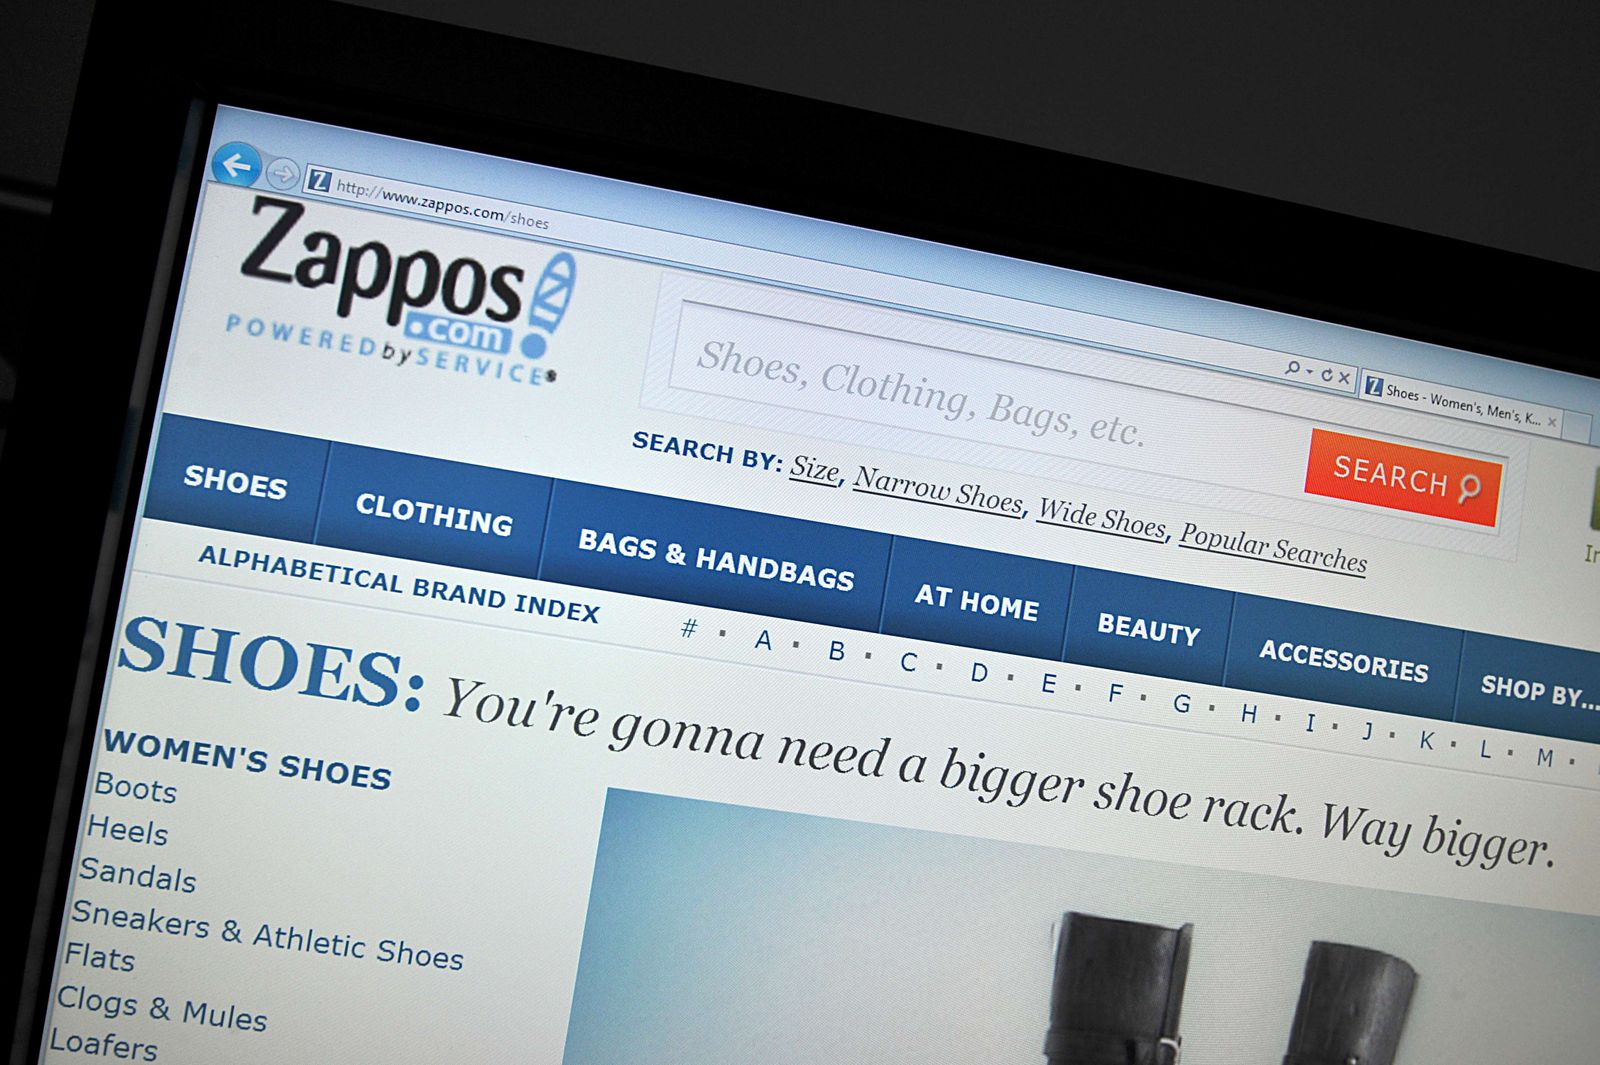 Zappos / Onlineshopping